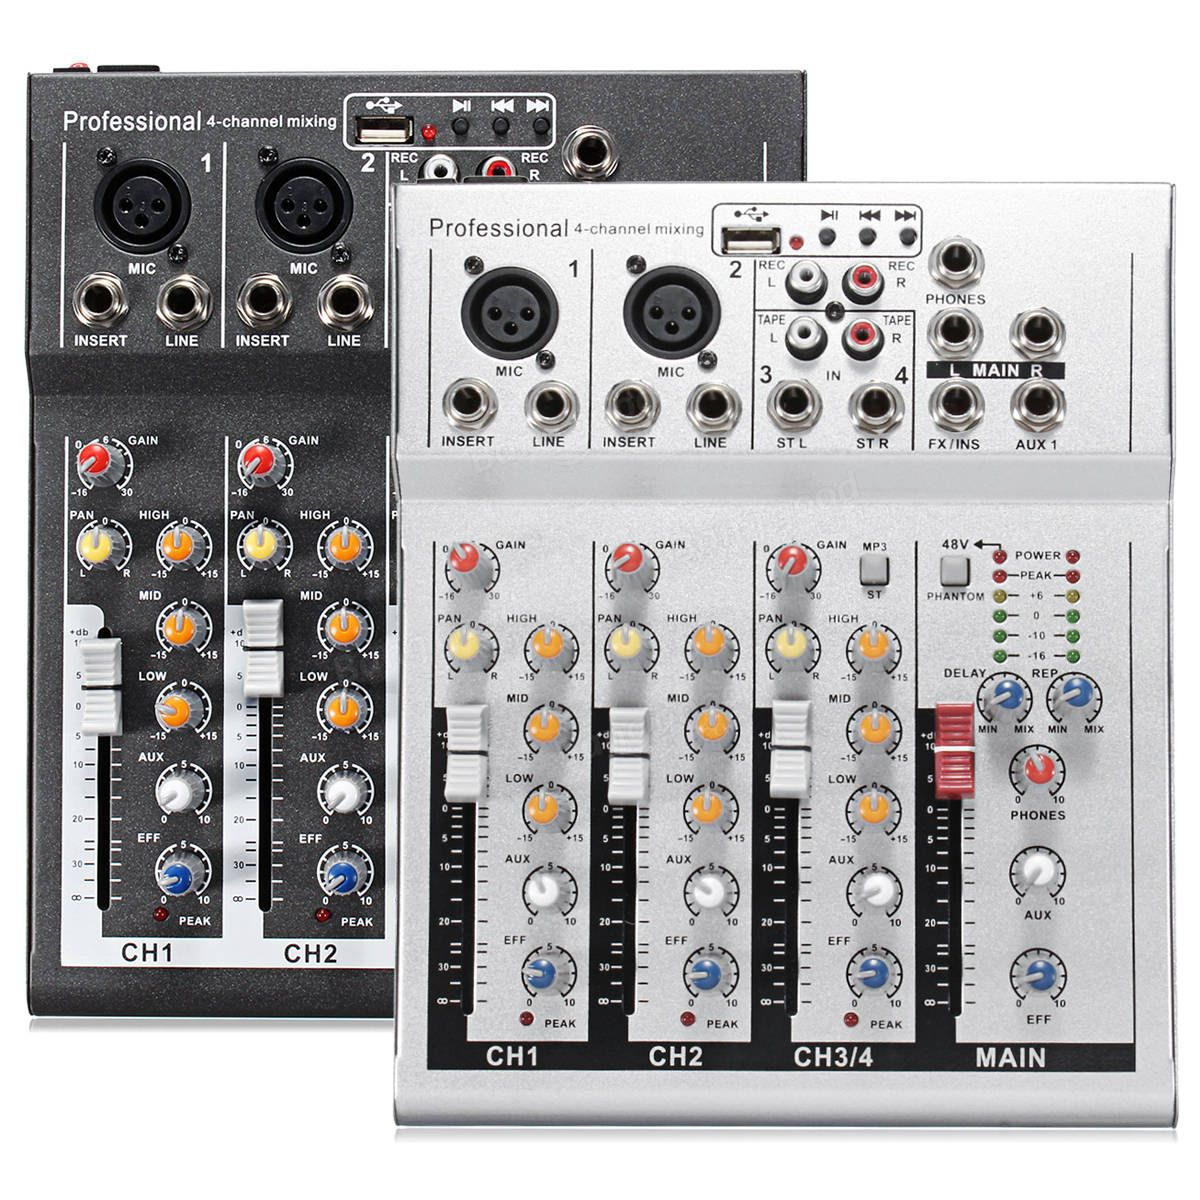 4 Kanalig Professional Live Mixing Studio Audio Ljud Usb Ktv Karaoke Mixer Console Hem Ljud Och Video From Elektronik On Banggood Com